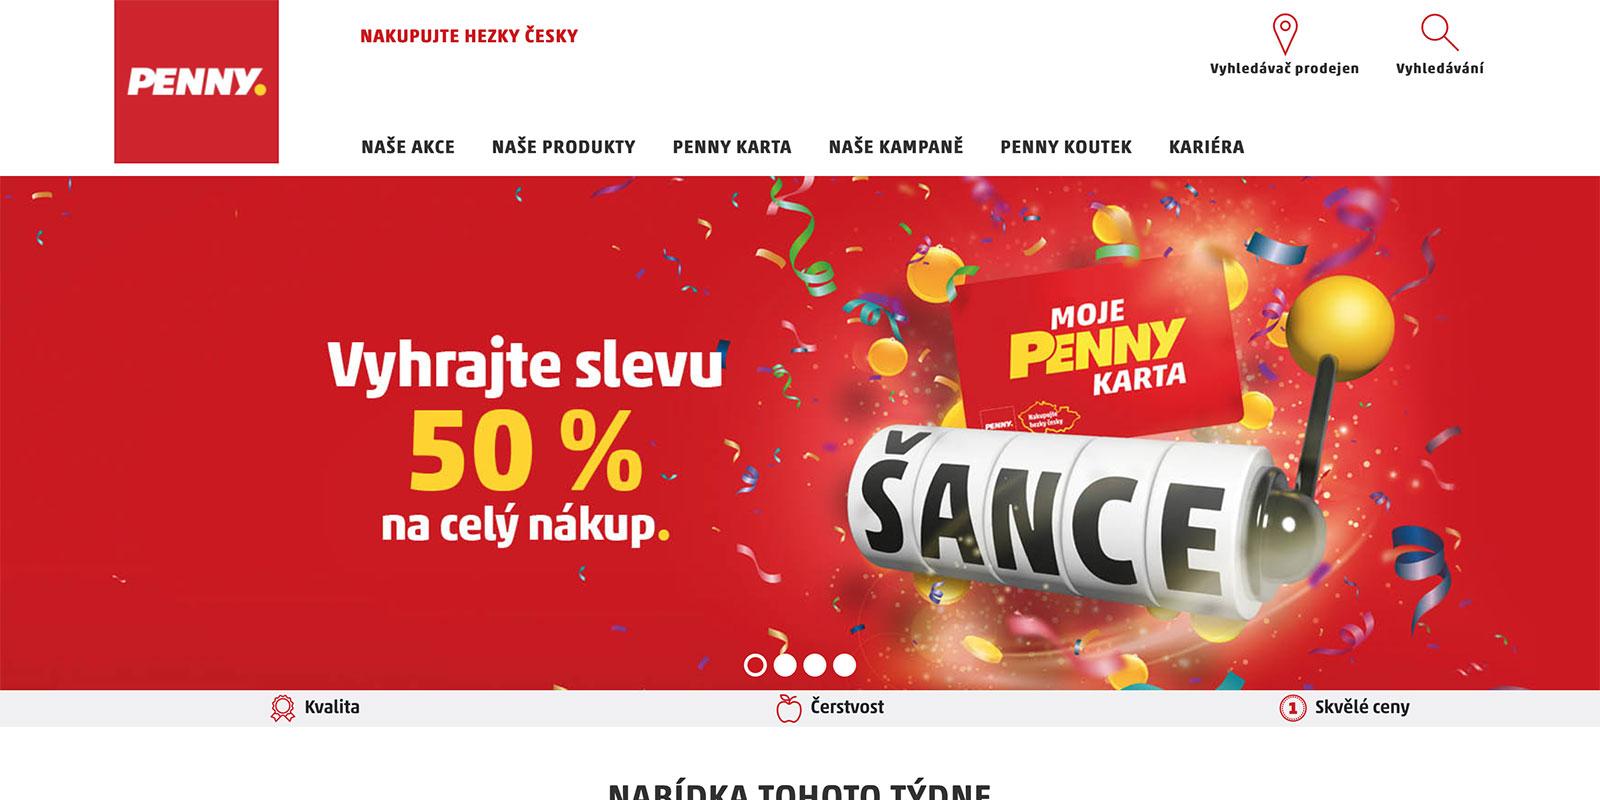 Webové stránky www.penny.cz